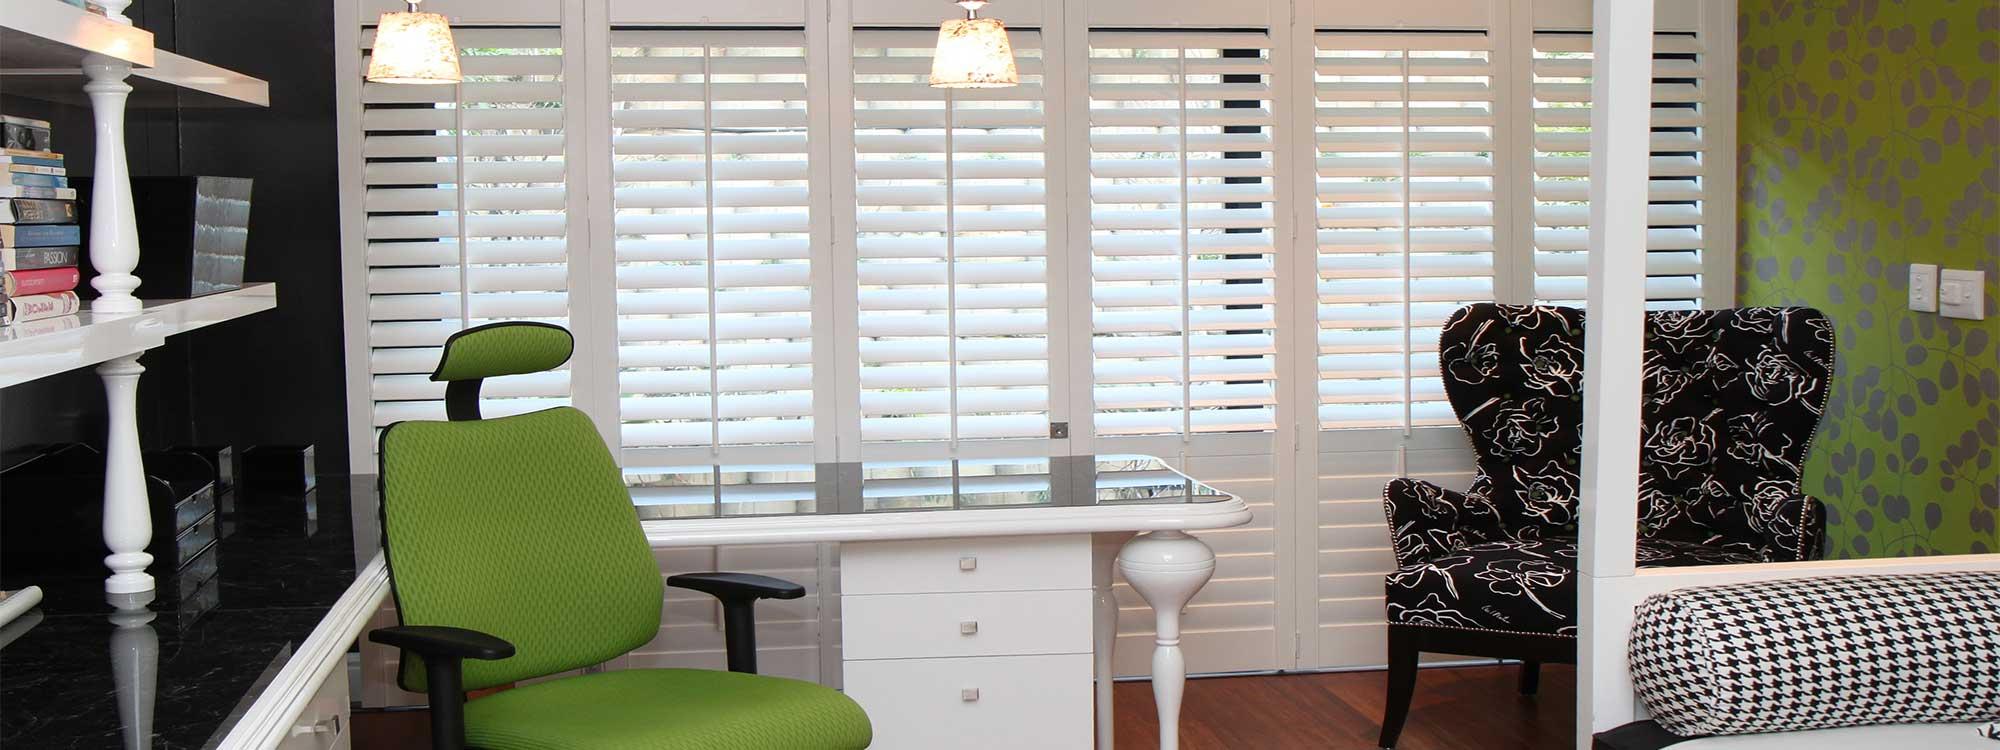 Decowood-shutters-bedroom-study-area-